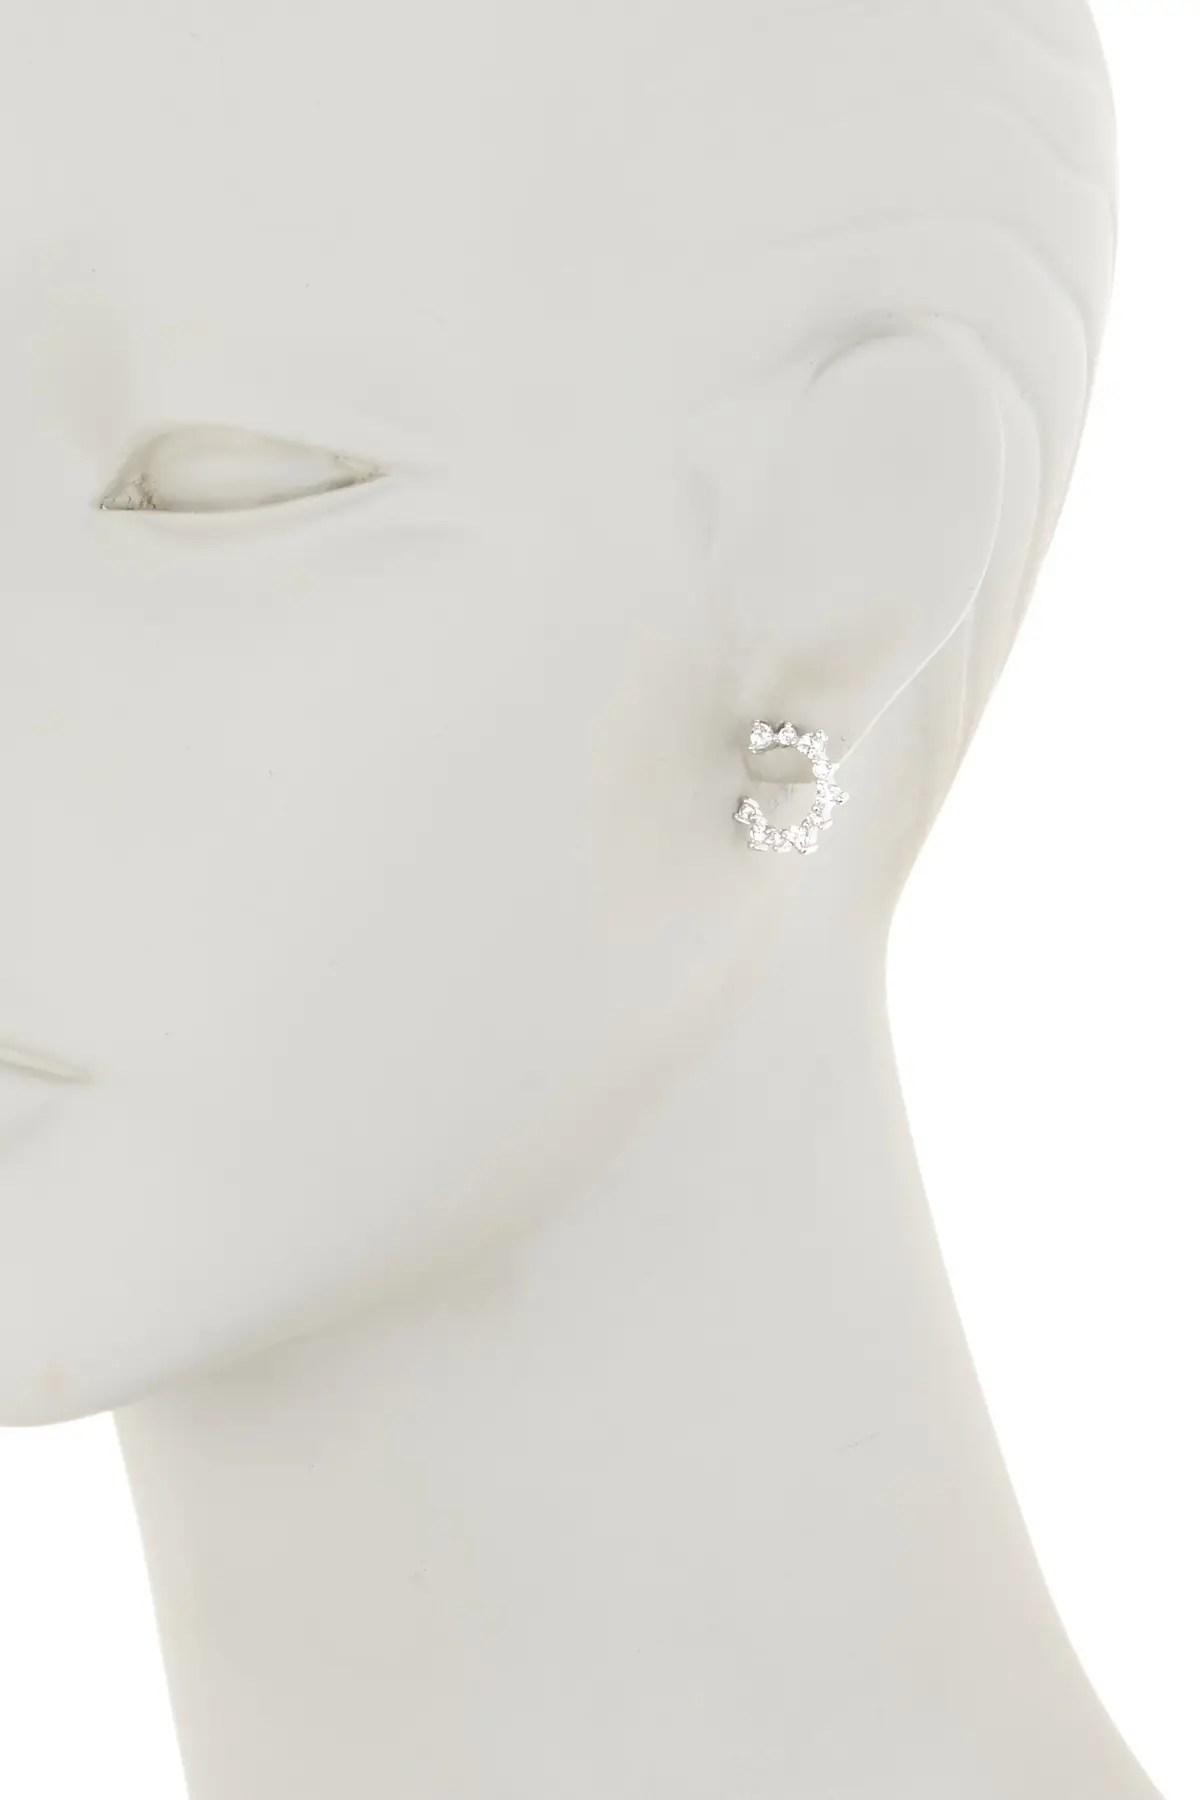 nordstrom rack pave cz curved stud earrings nordstrom rack